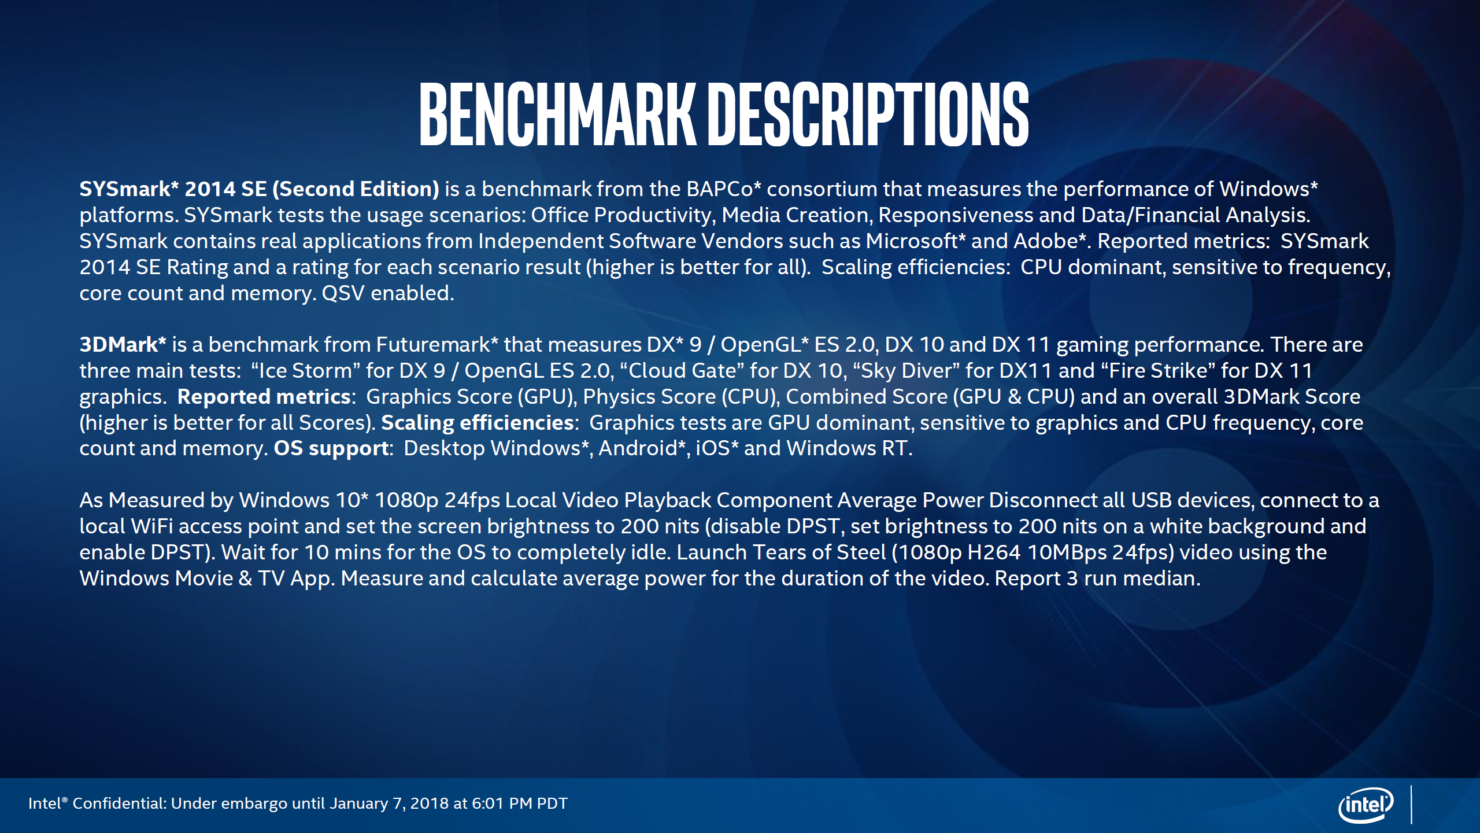 intel-8th-generation-core-processors-with-amd-radeon-rx-vega-m-graphics_28